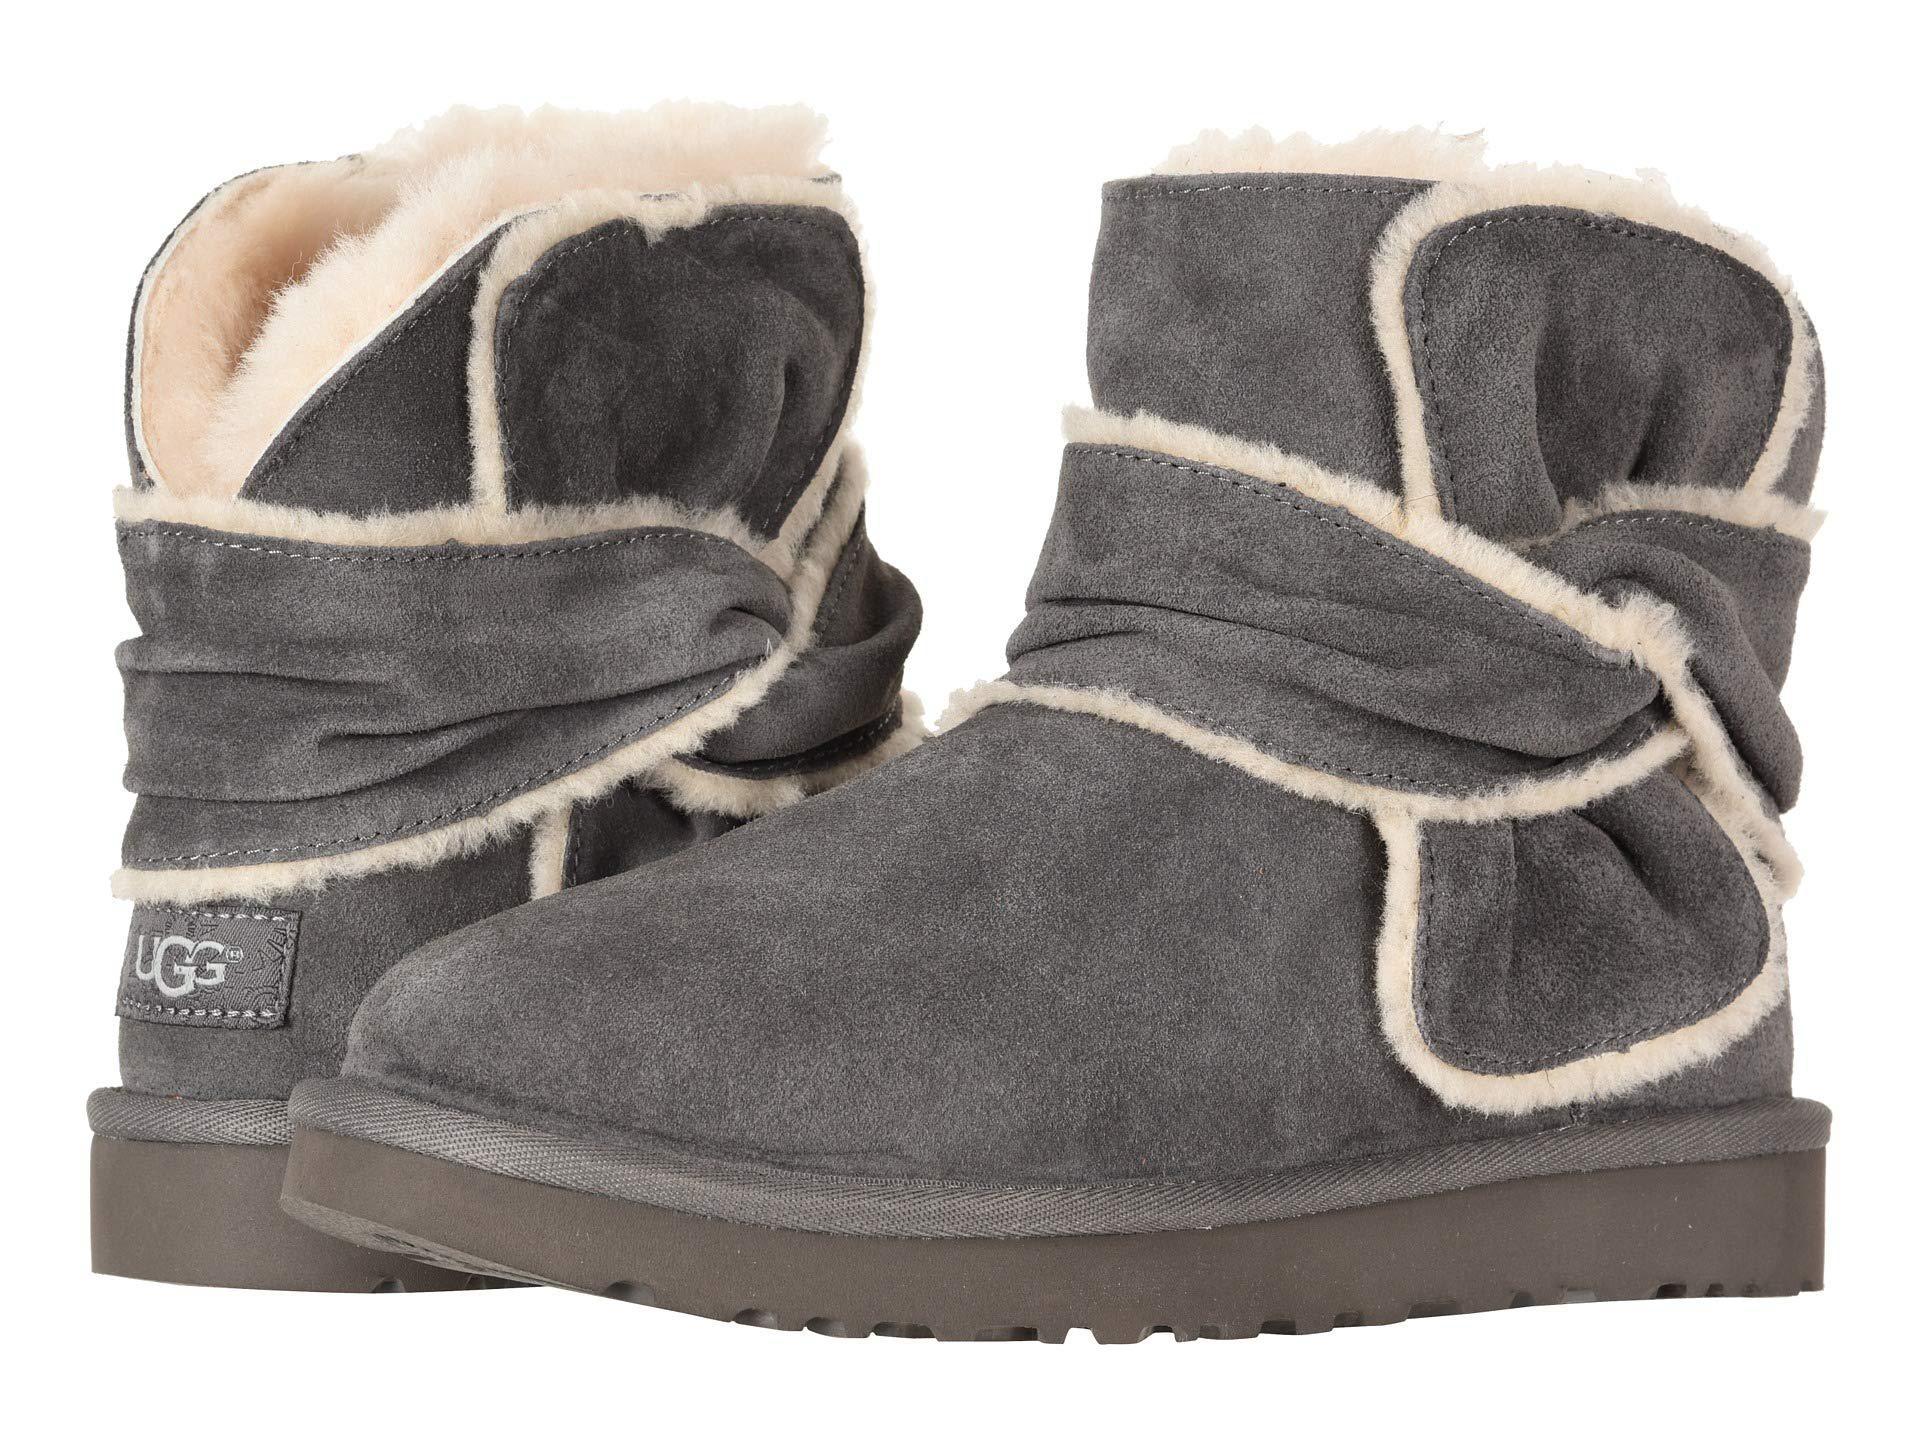 75d14d096e Lyst - UGG Mini Spill Seam Bow (chestnut) Women s Pull-on Boots in Gray